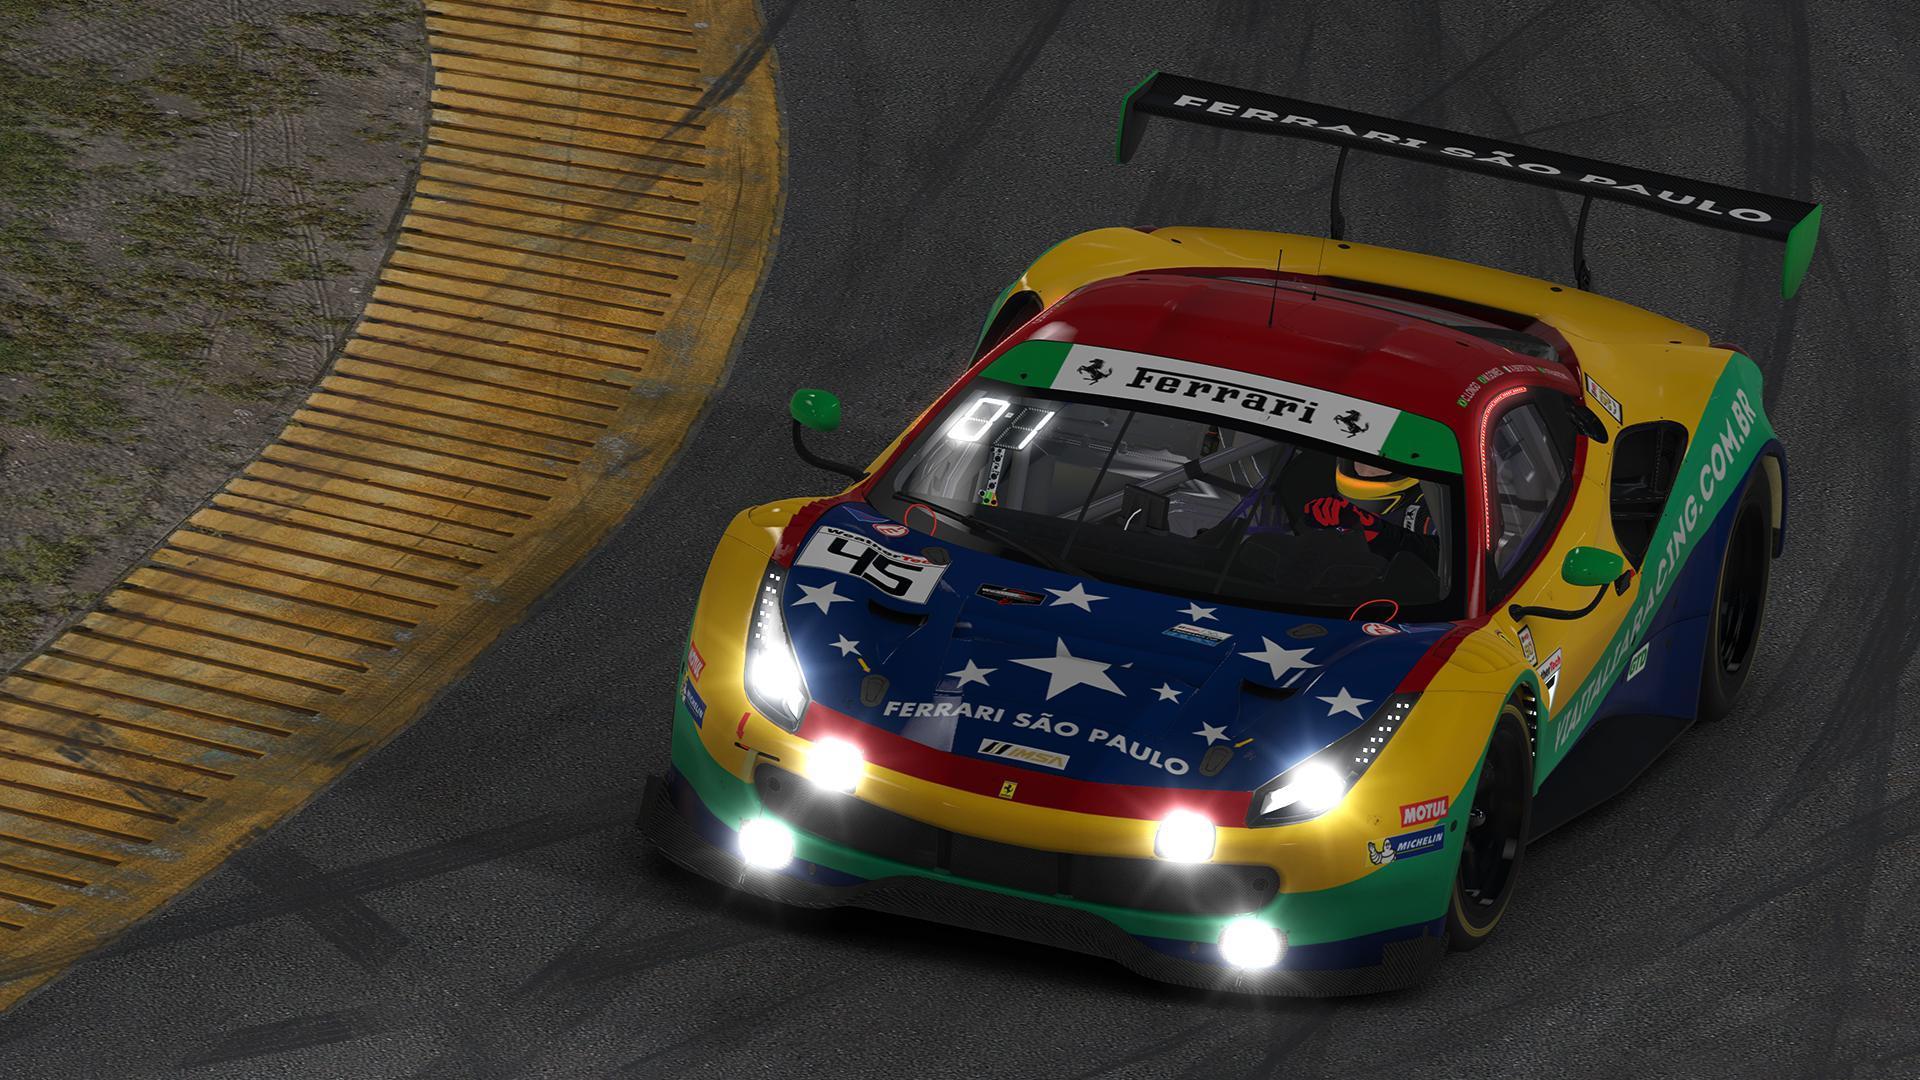 Preview of 2019 IMSA GTD - #13 Via Italia Racing by Jann Dircks